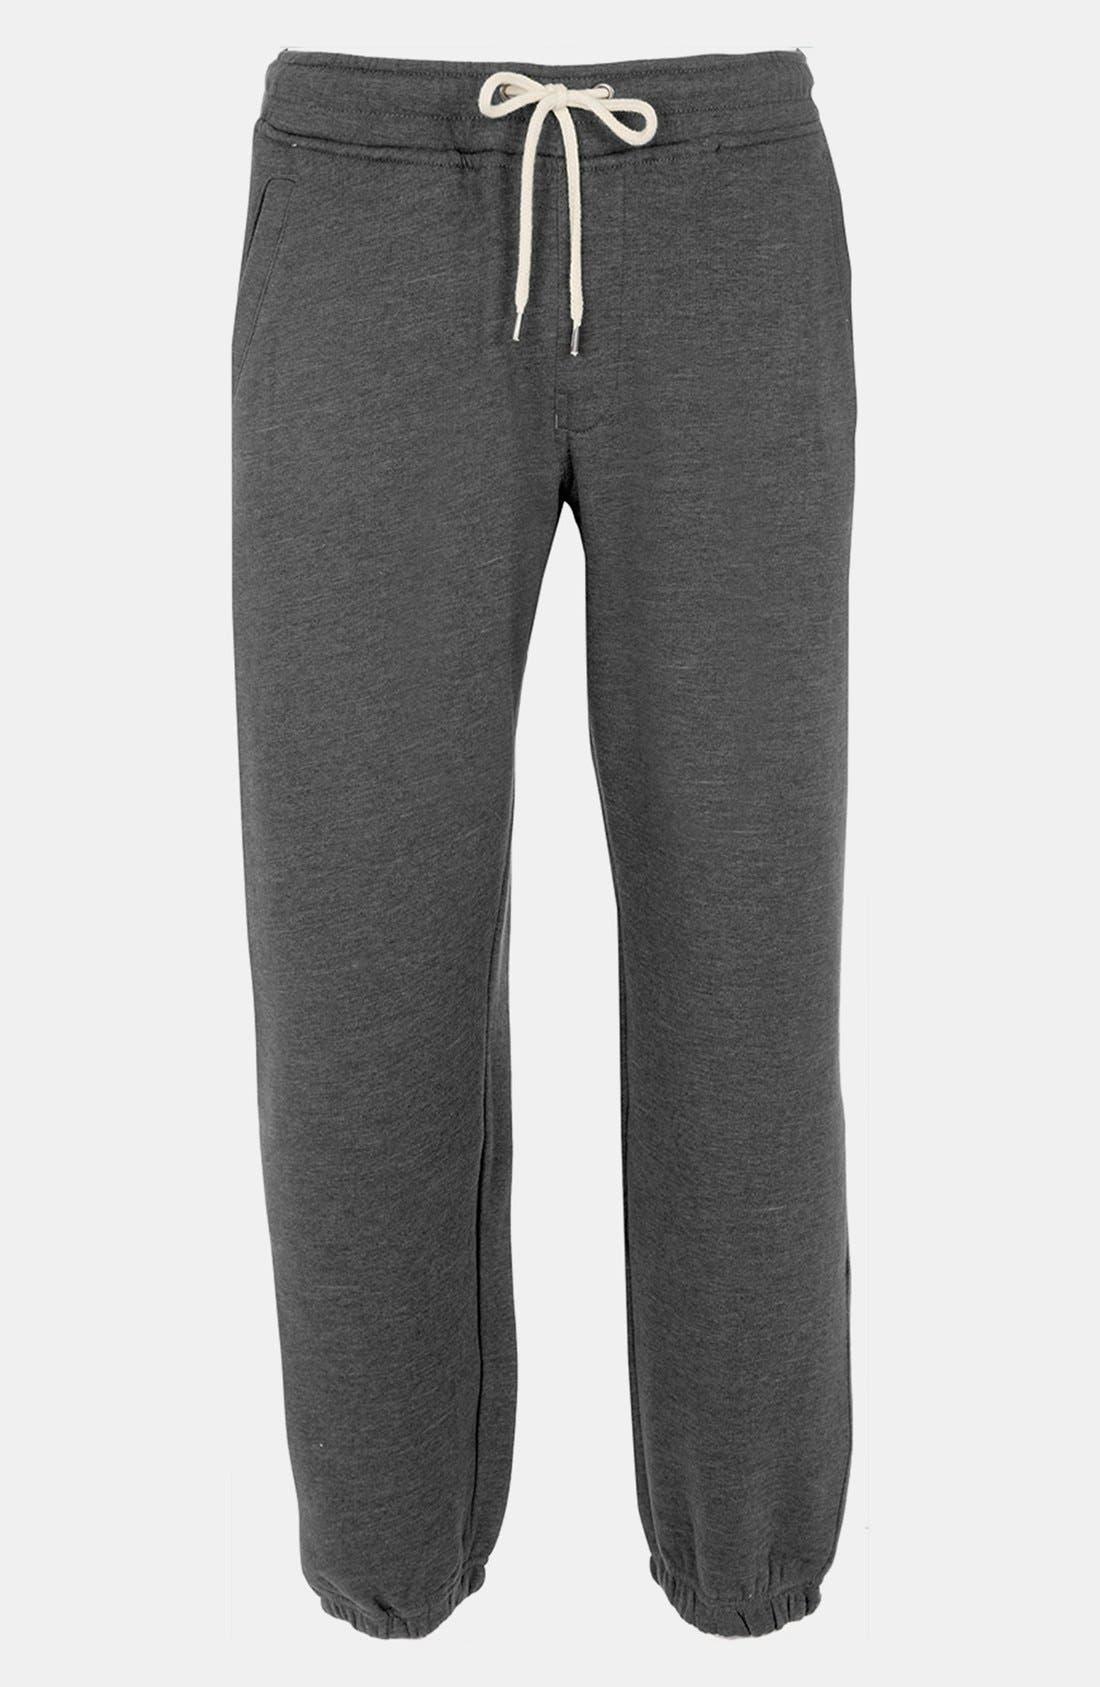 Alternate Image 1 Selected - Topman 'Macho' Athletic Pants